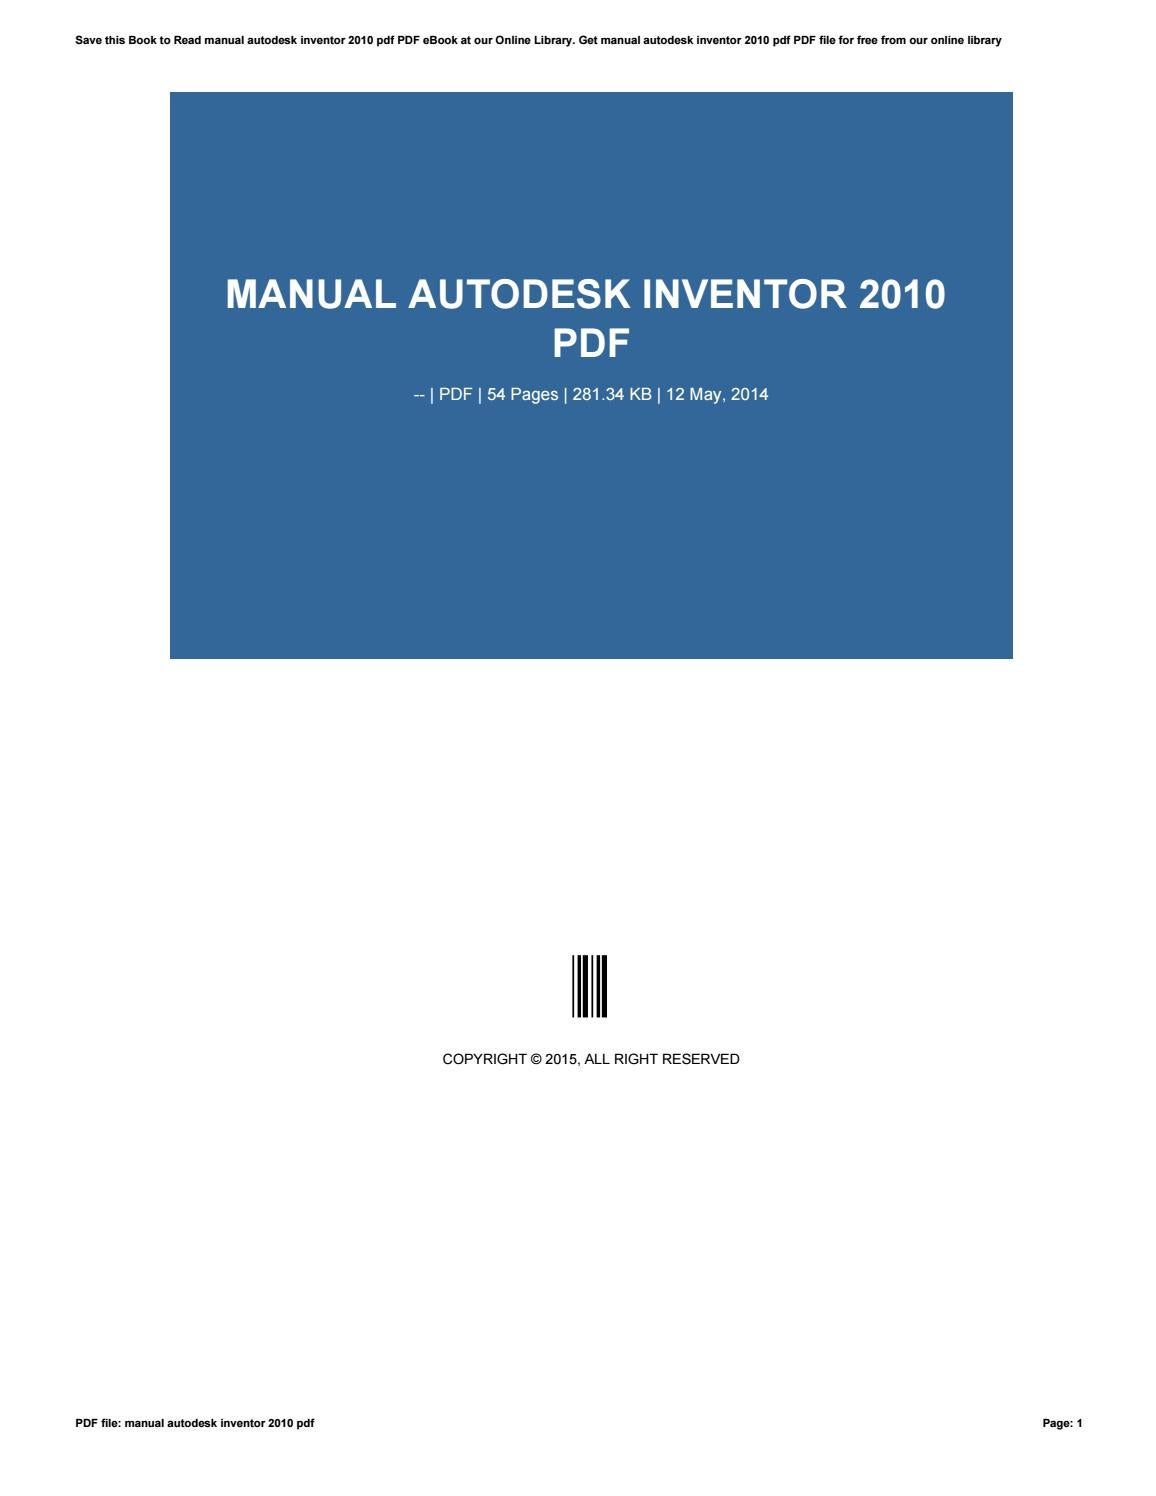 manual autodesk inventor 2010 pdf by reddit5 issuu rh issuu com Autodesk Inventor Projects autodesk inventor 2010 tutorial sheet metal design